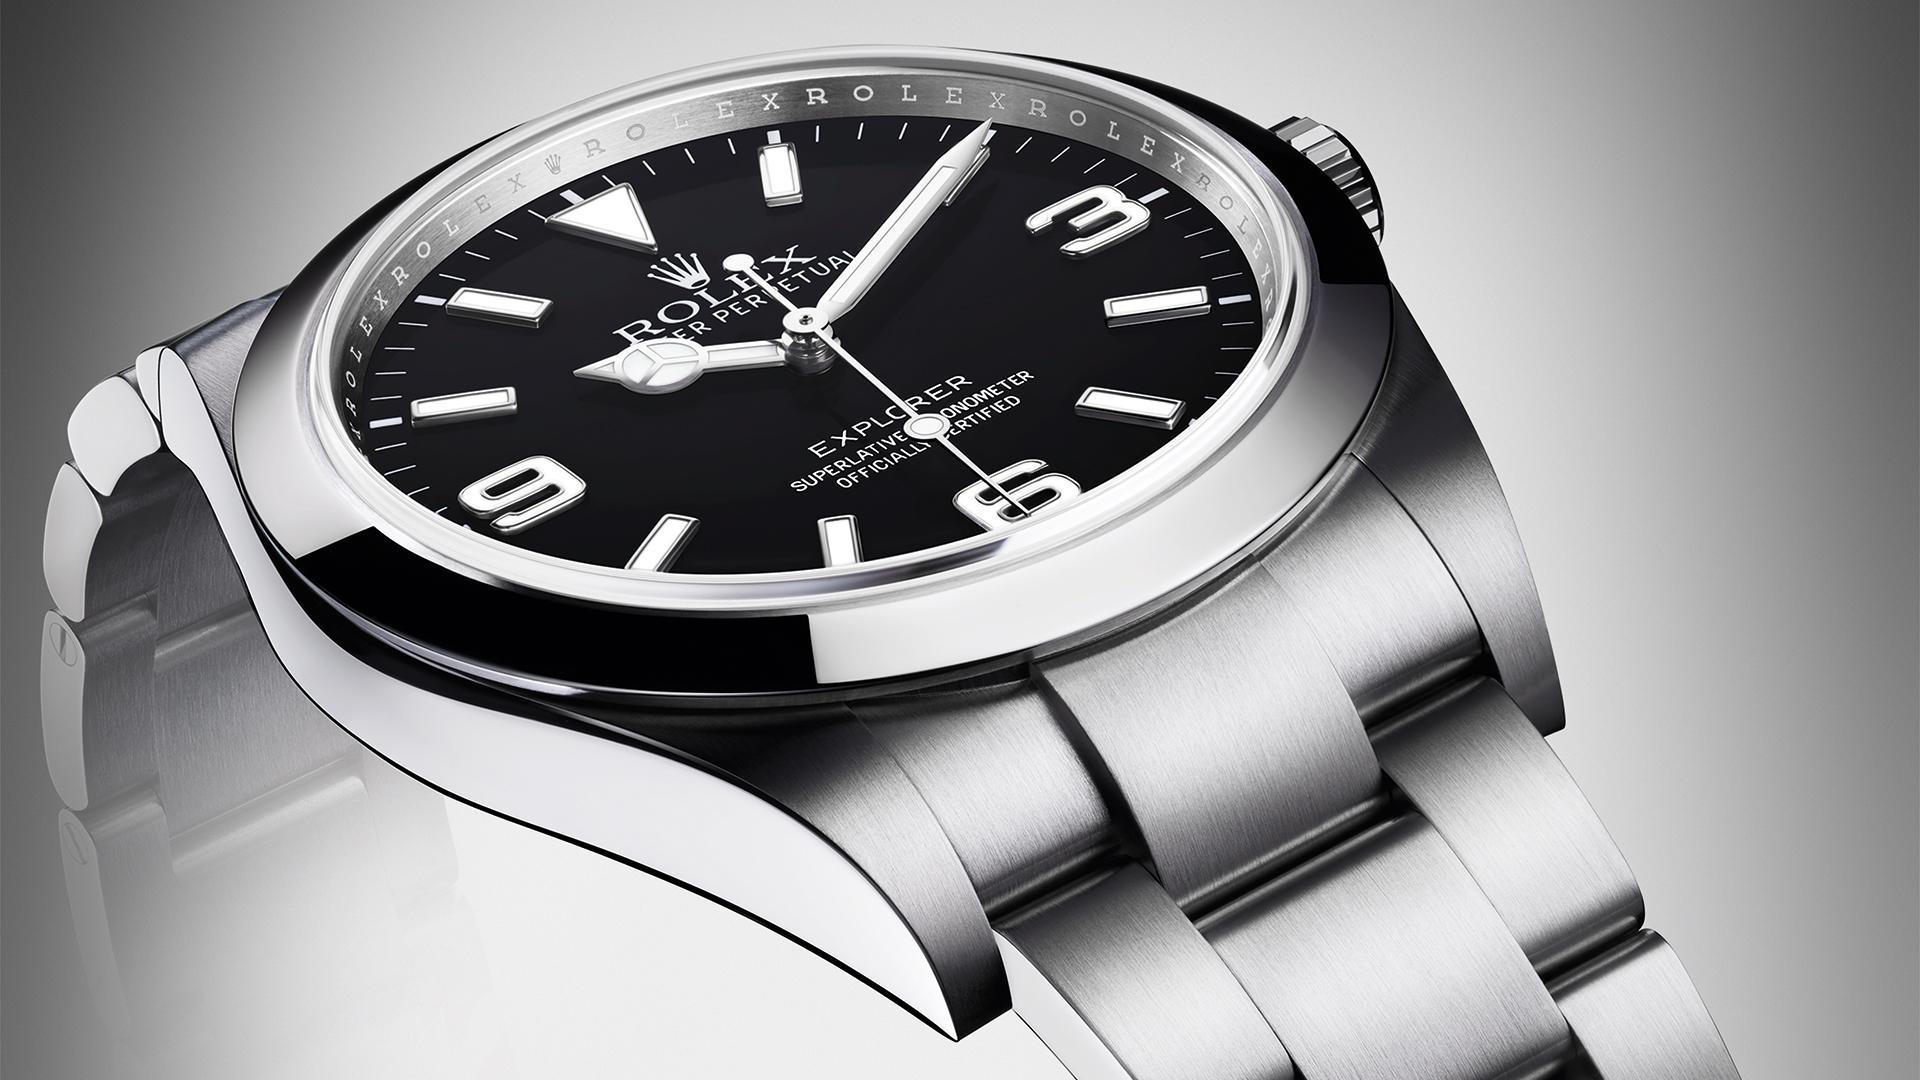 Rolex Explorer field watch